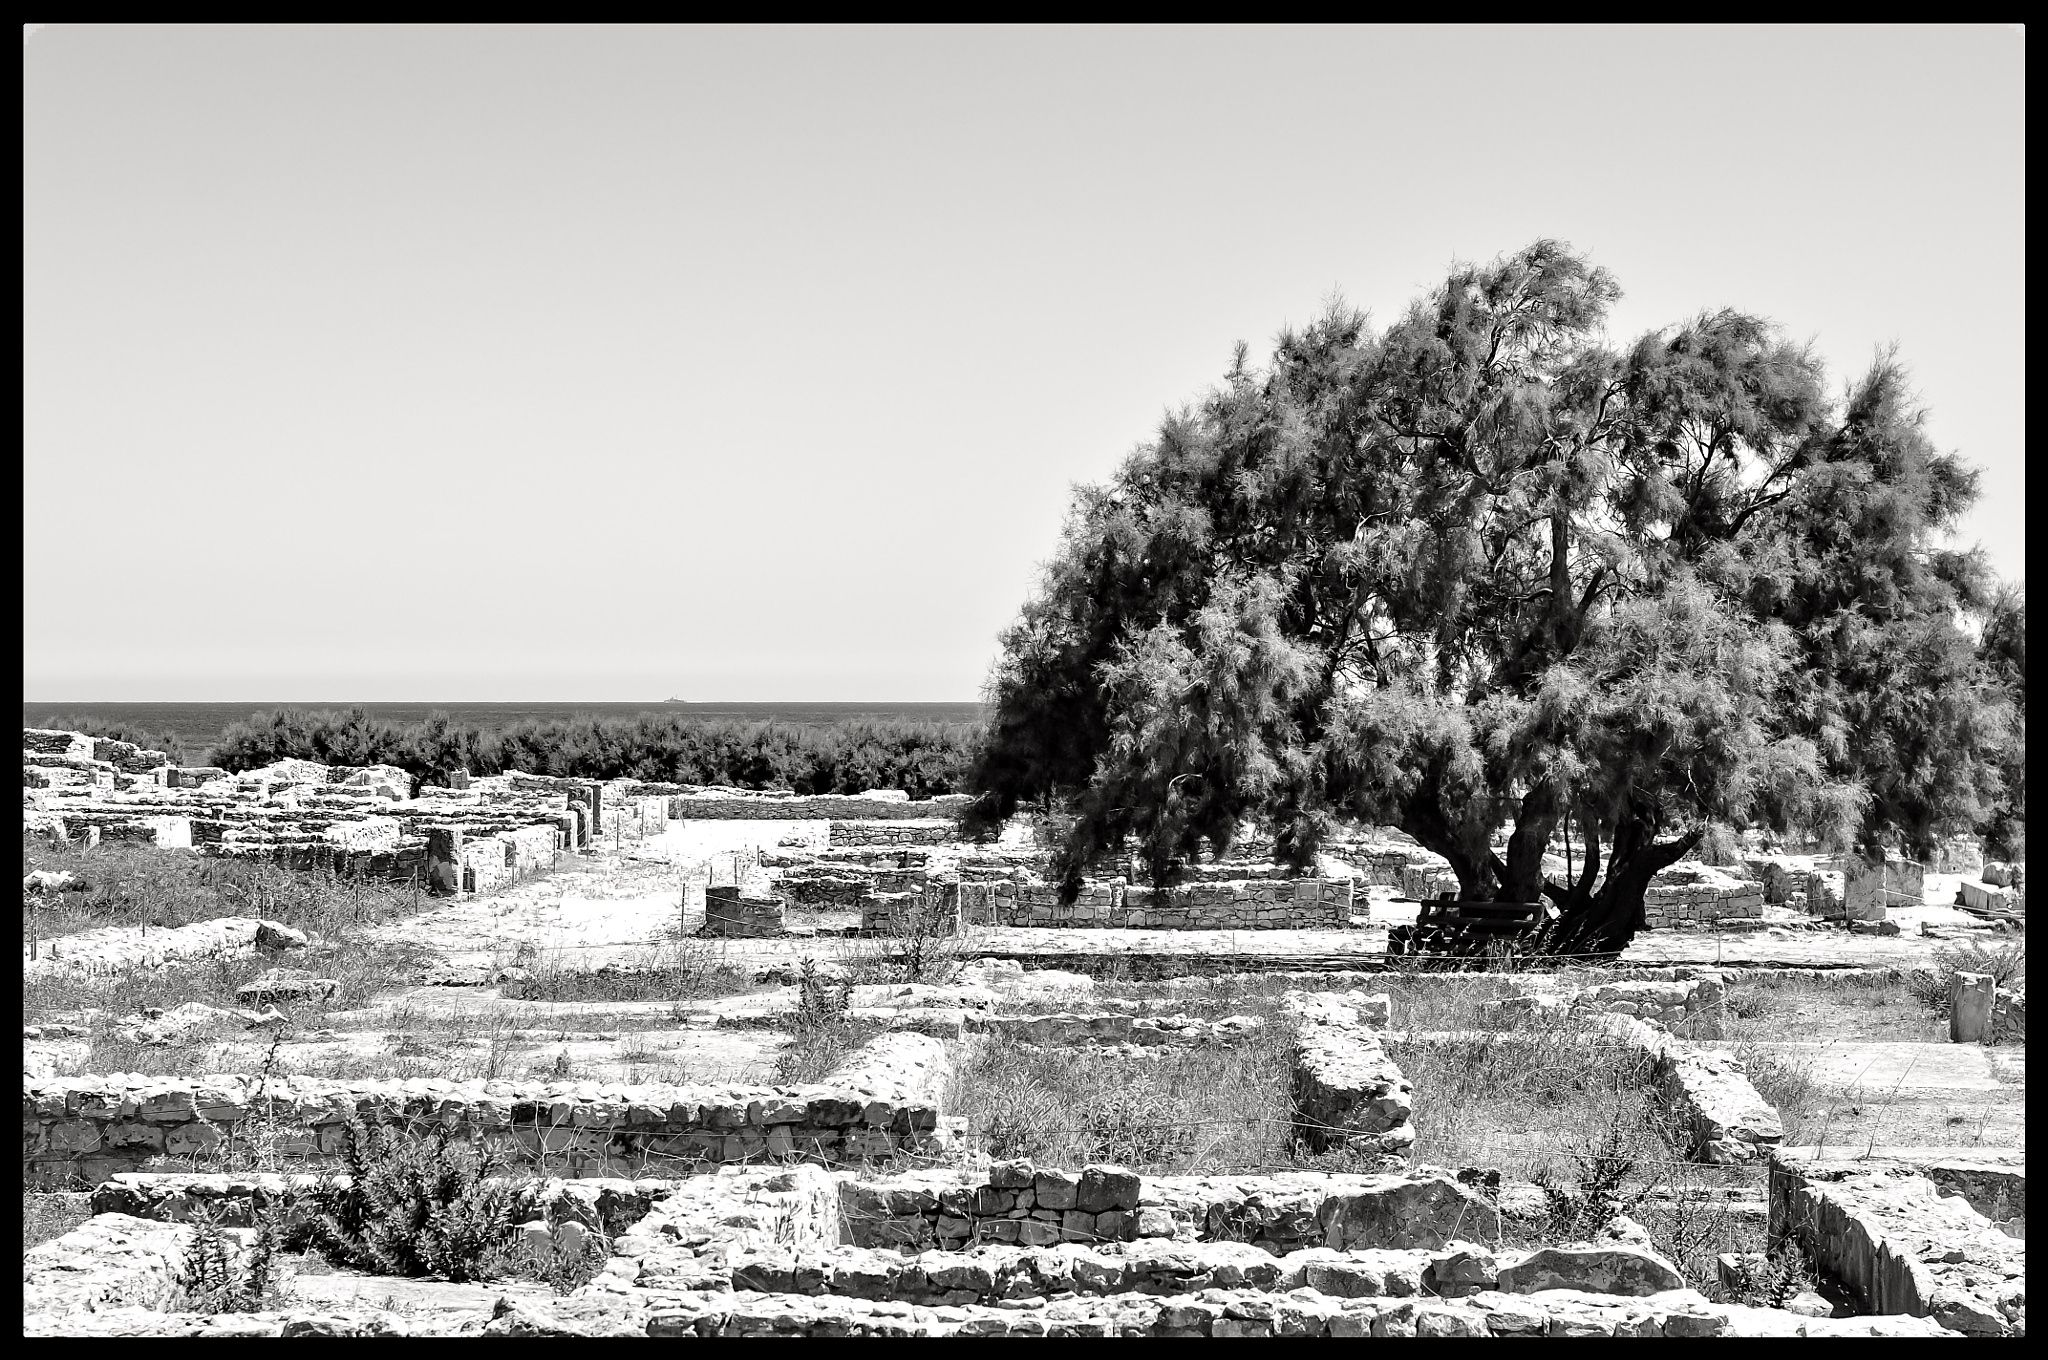 Tunisia, an old history -